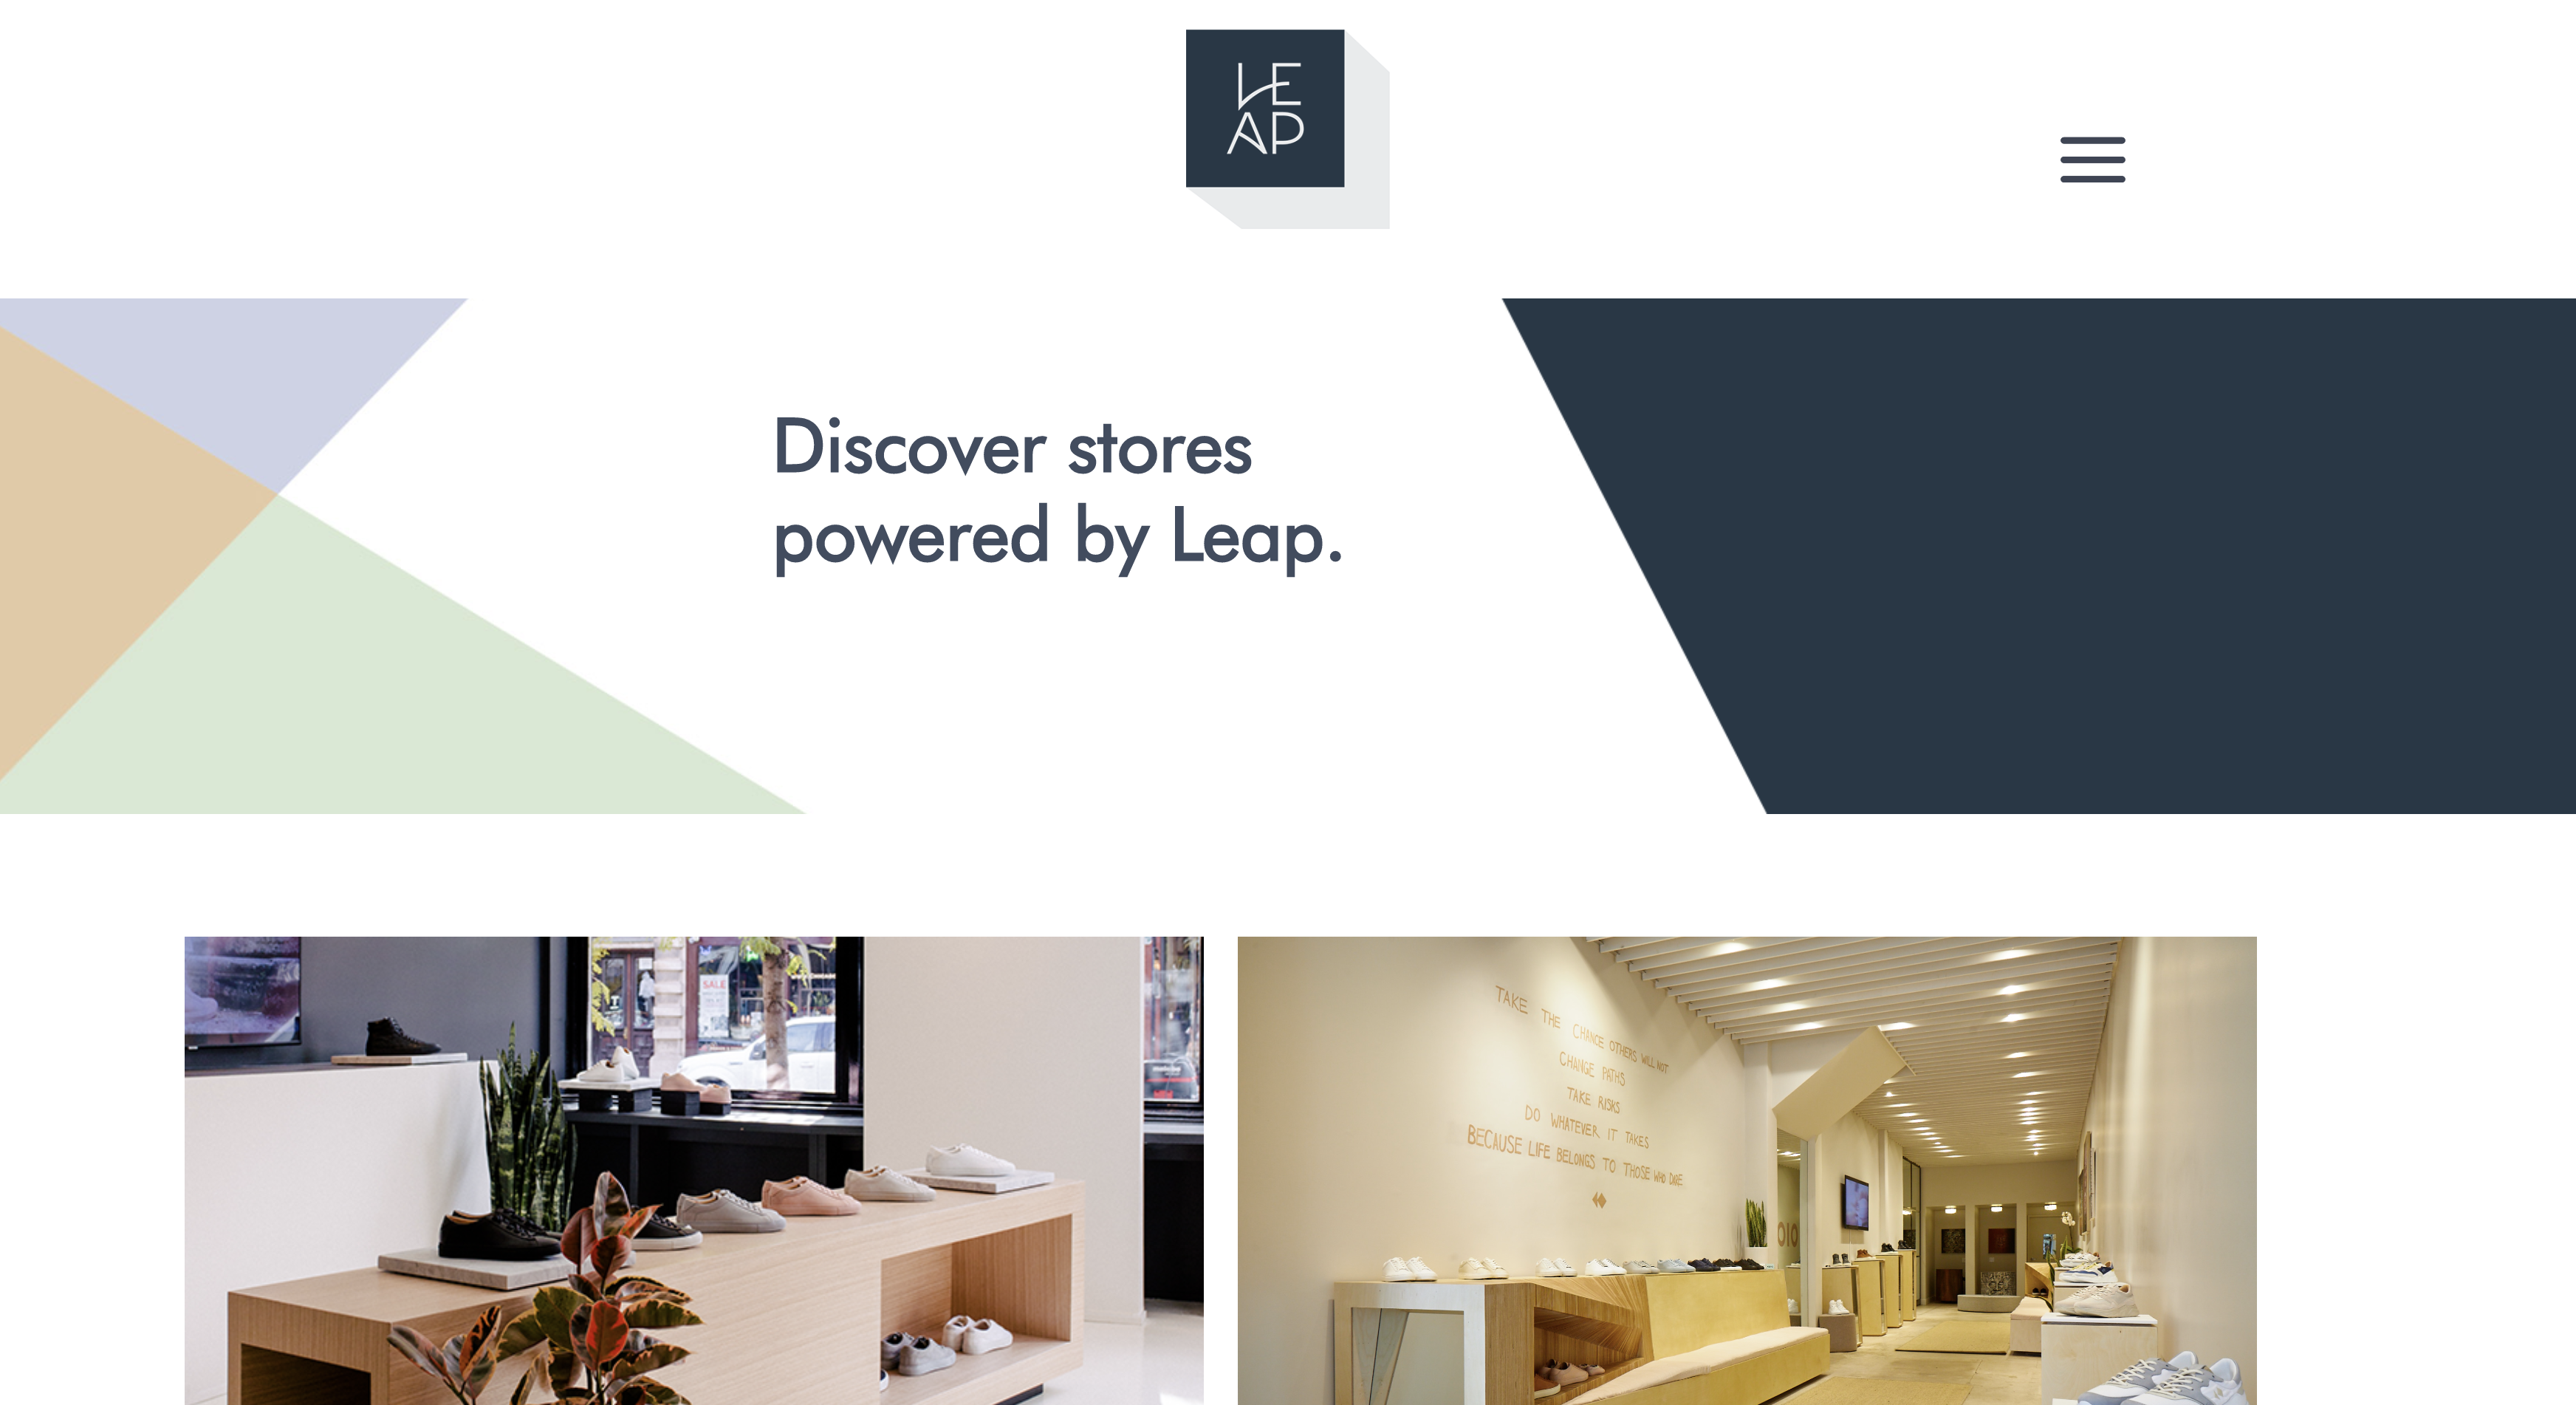 Leap Stores